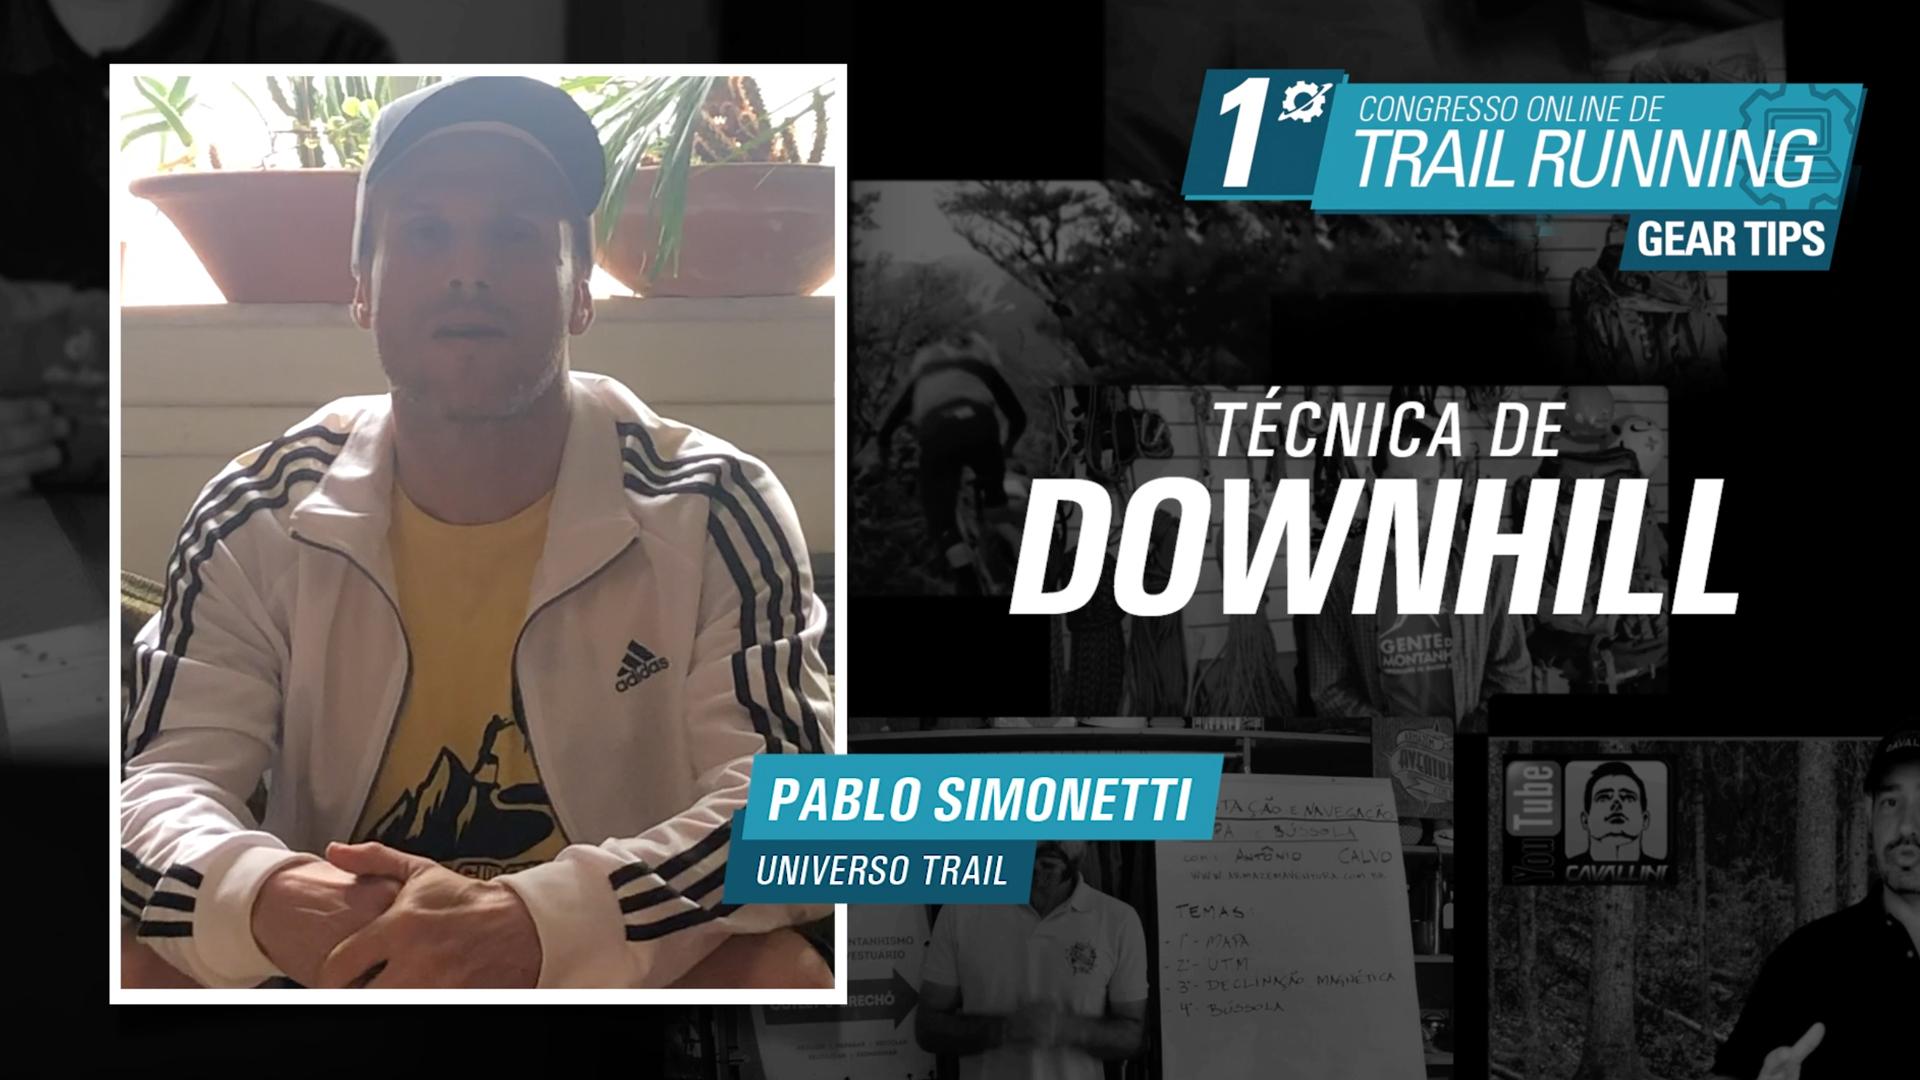 Técnica de Downhill - Pablo Simonetti